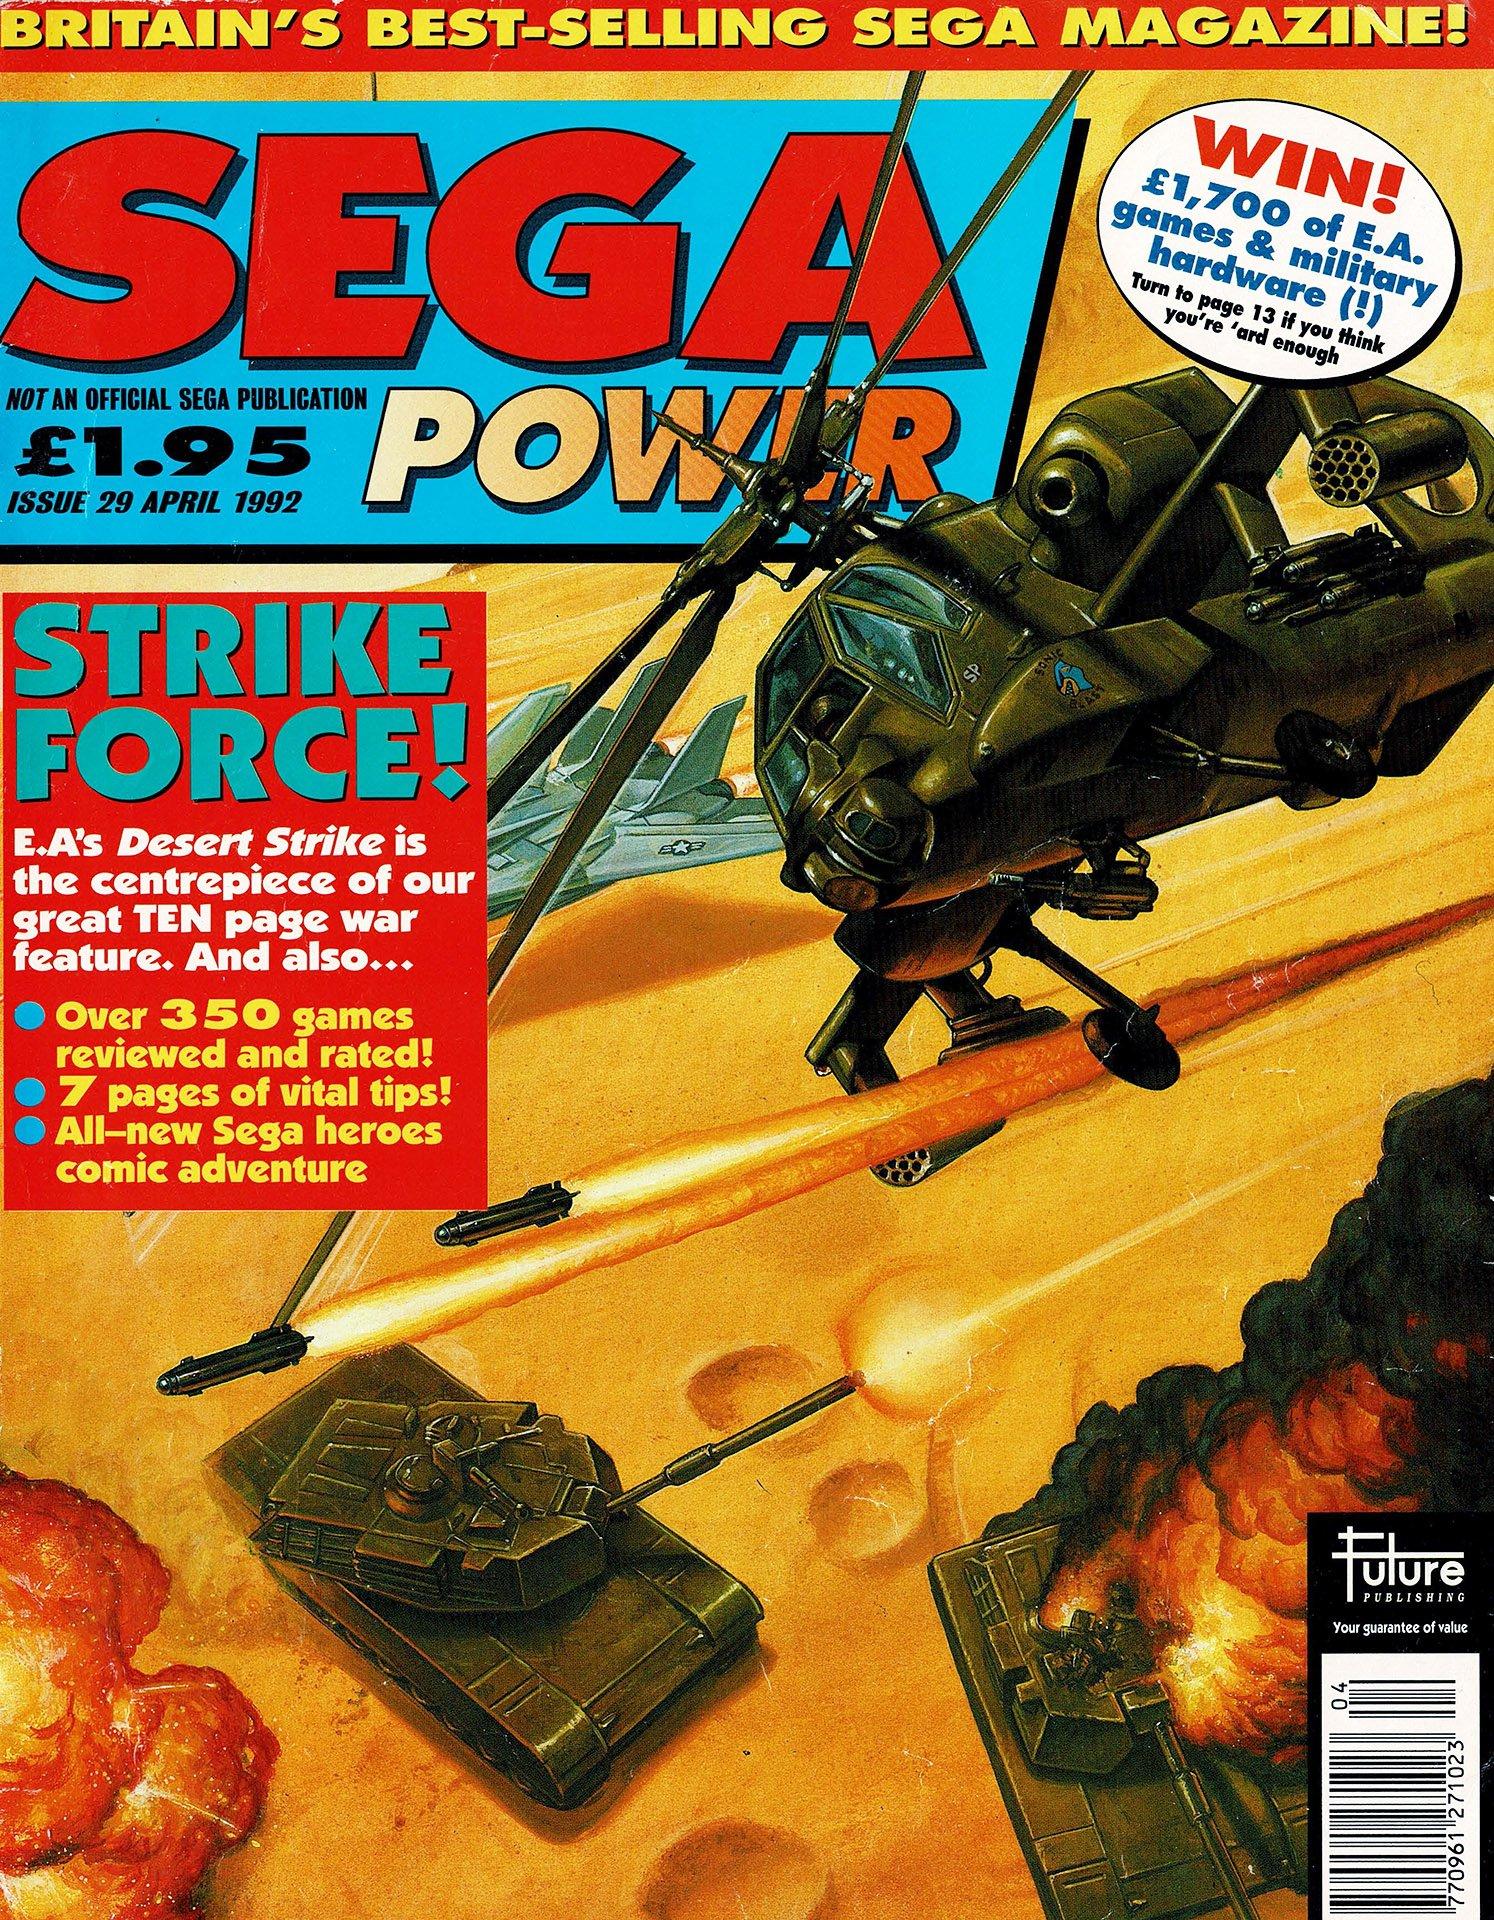 Sega Power Issue 29 (April 1992)